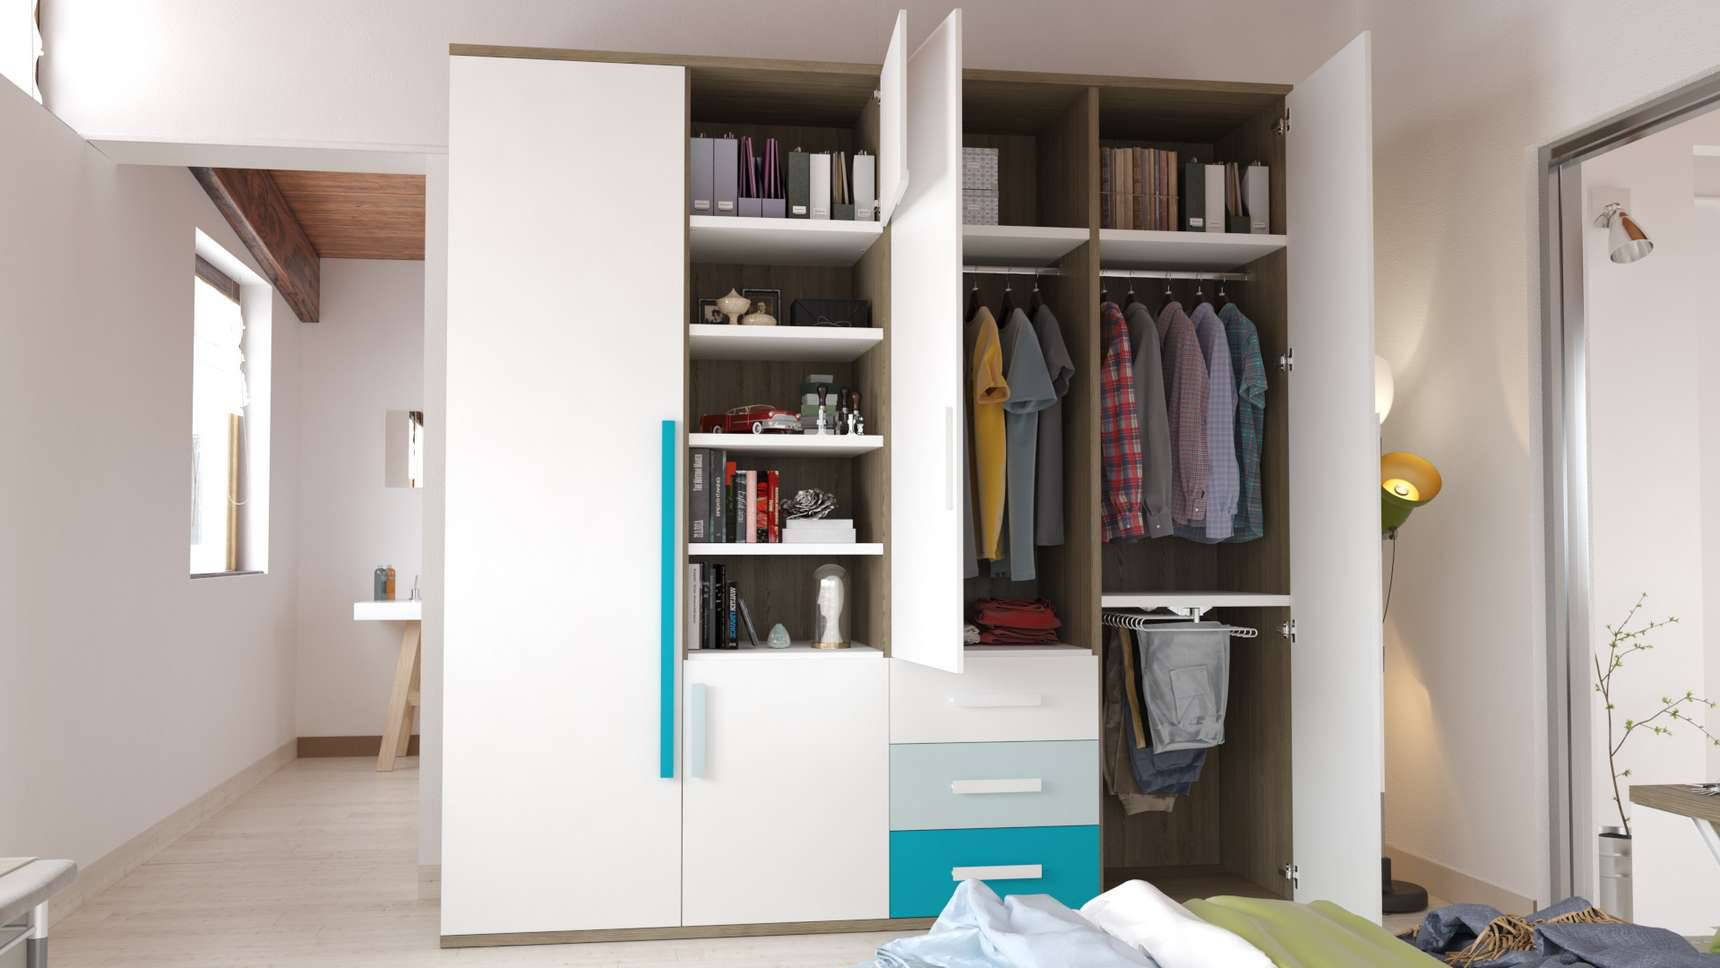 Ideh bita armario de libre configuraci n - Disenador de armarios ...